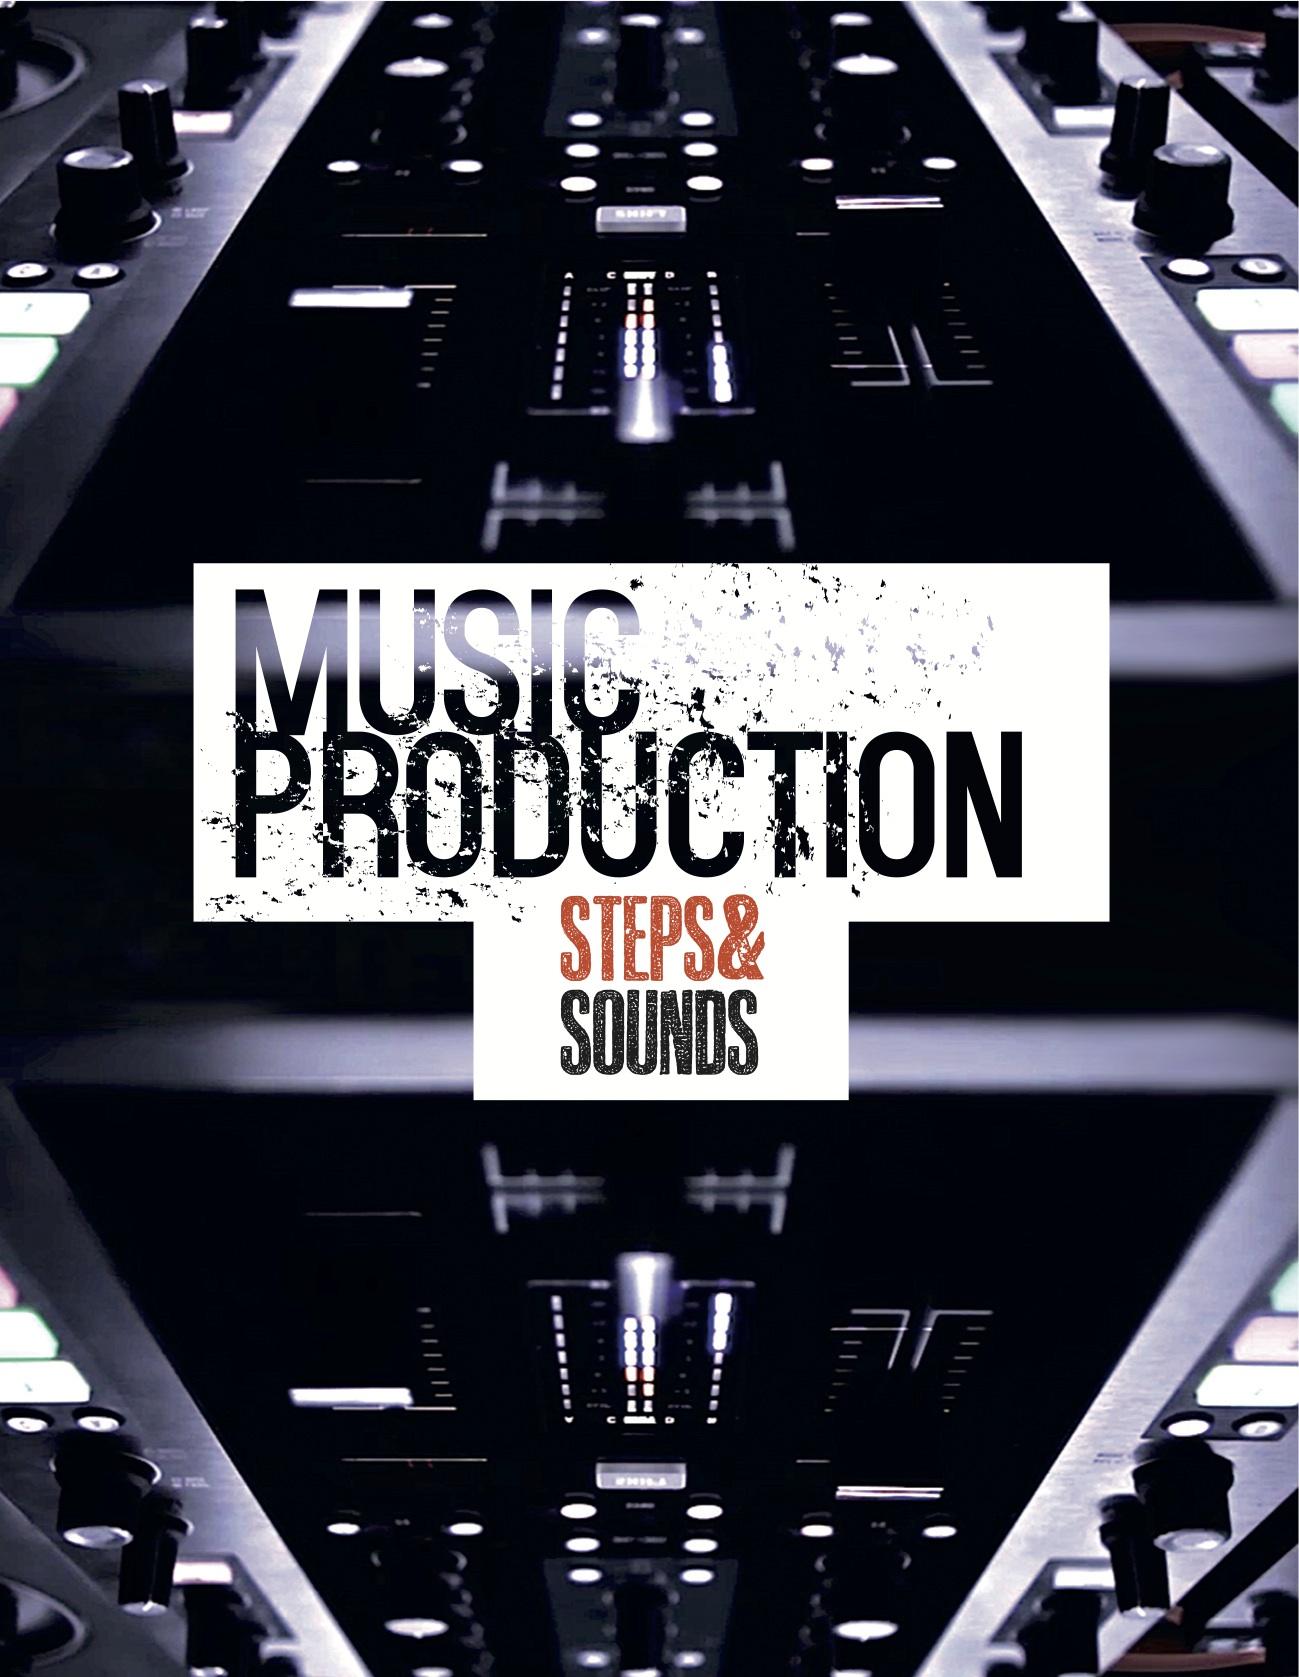 Music Prod Front Final.jpg